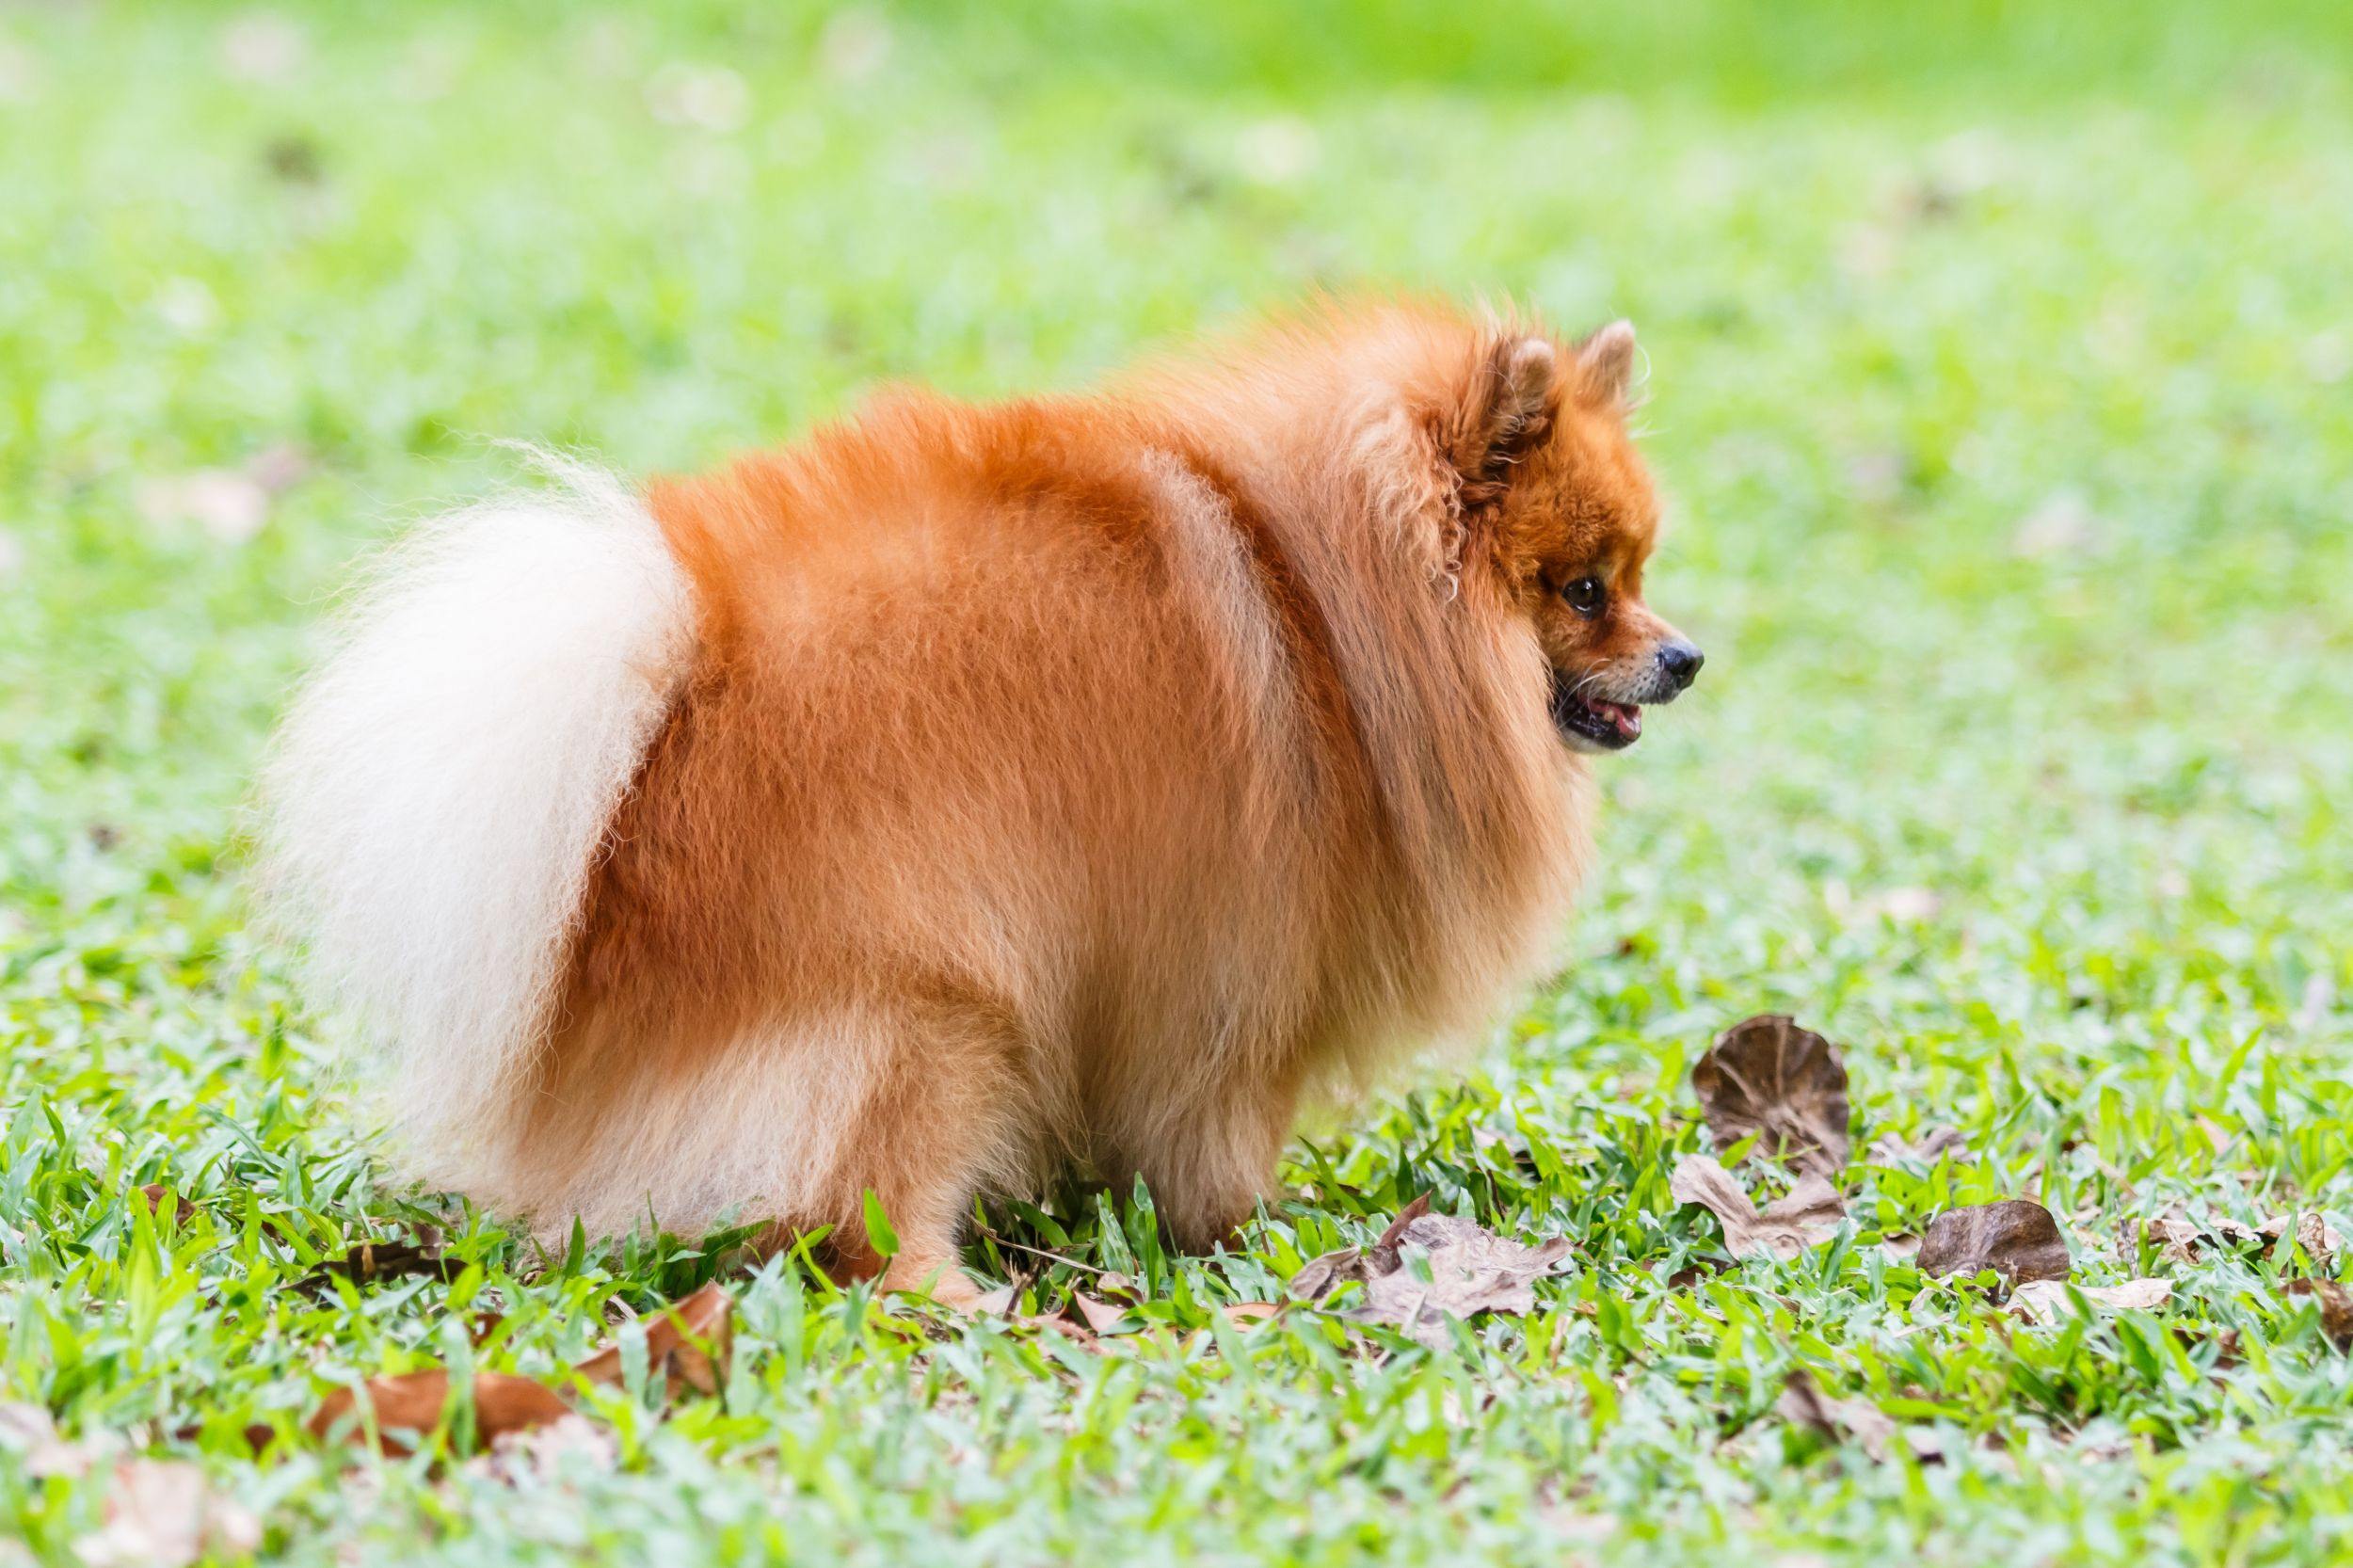 Dogilike.com :: กองปราบเตือน ปล่อยน้องหมาอึกลางถนนแล้วไม่เก็บ แจ้งจับได้!!